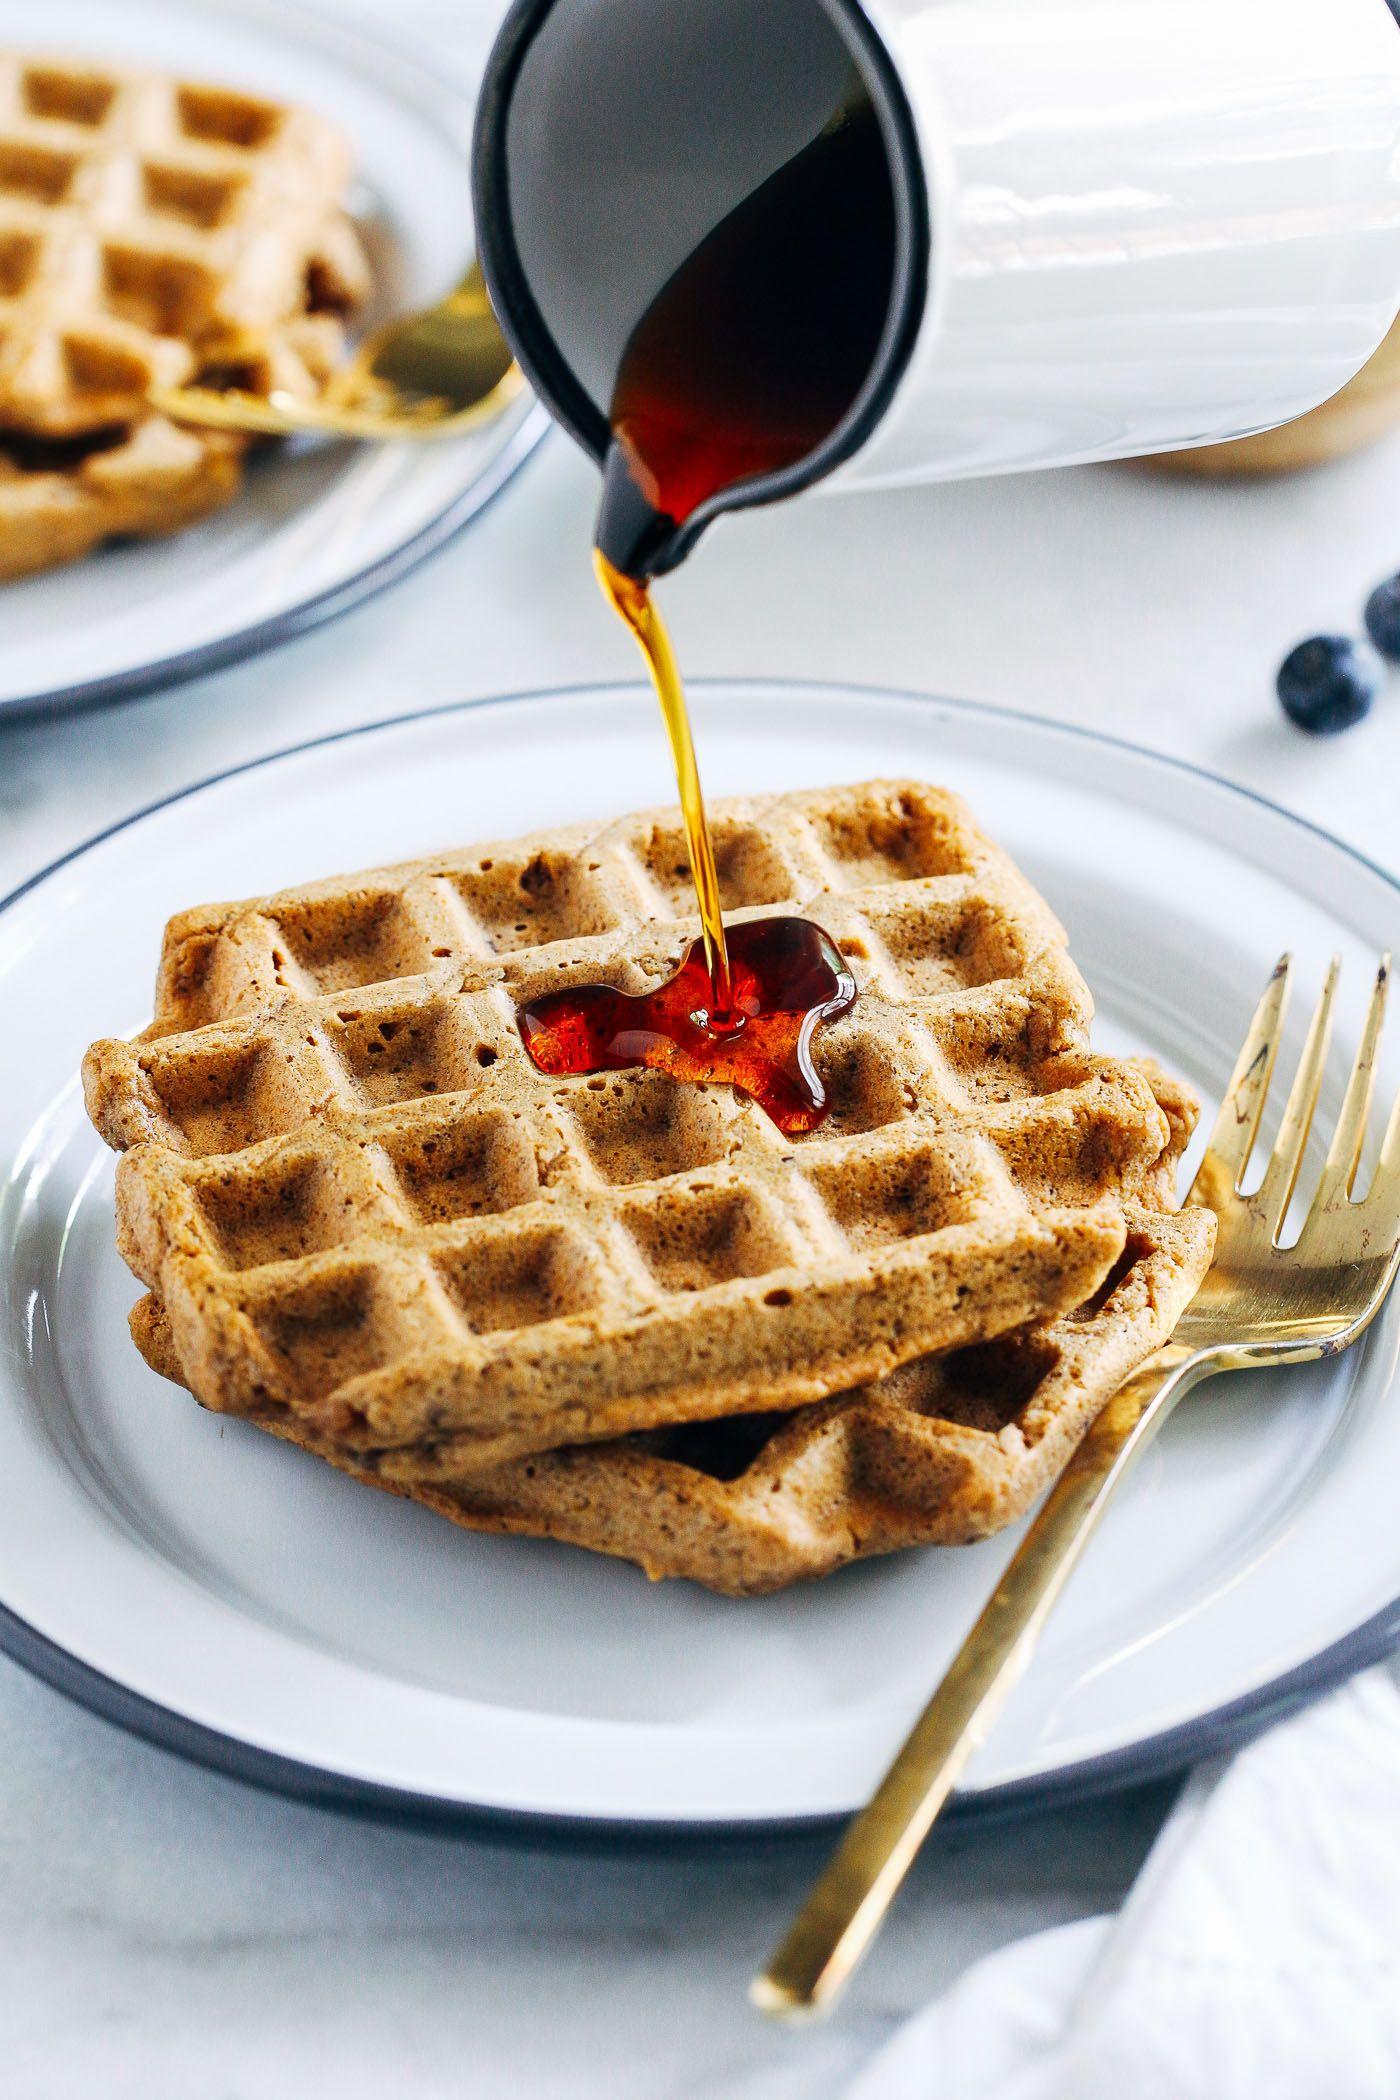 Vegan Gluten Free Oat Flour Waffles Making Thyme For Health Recipe Vegan Waffles Healthy Waffles Vegan Gluten Free